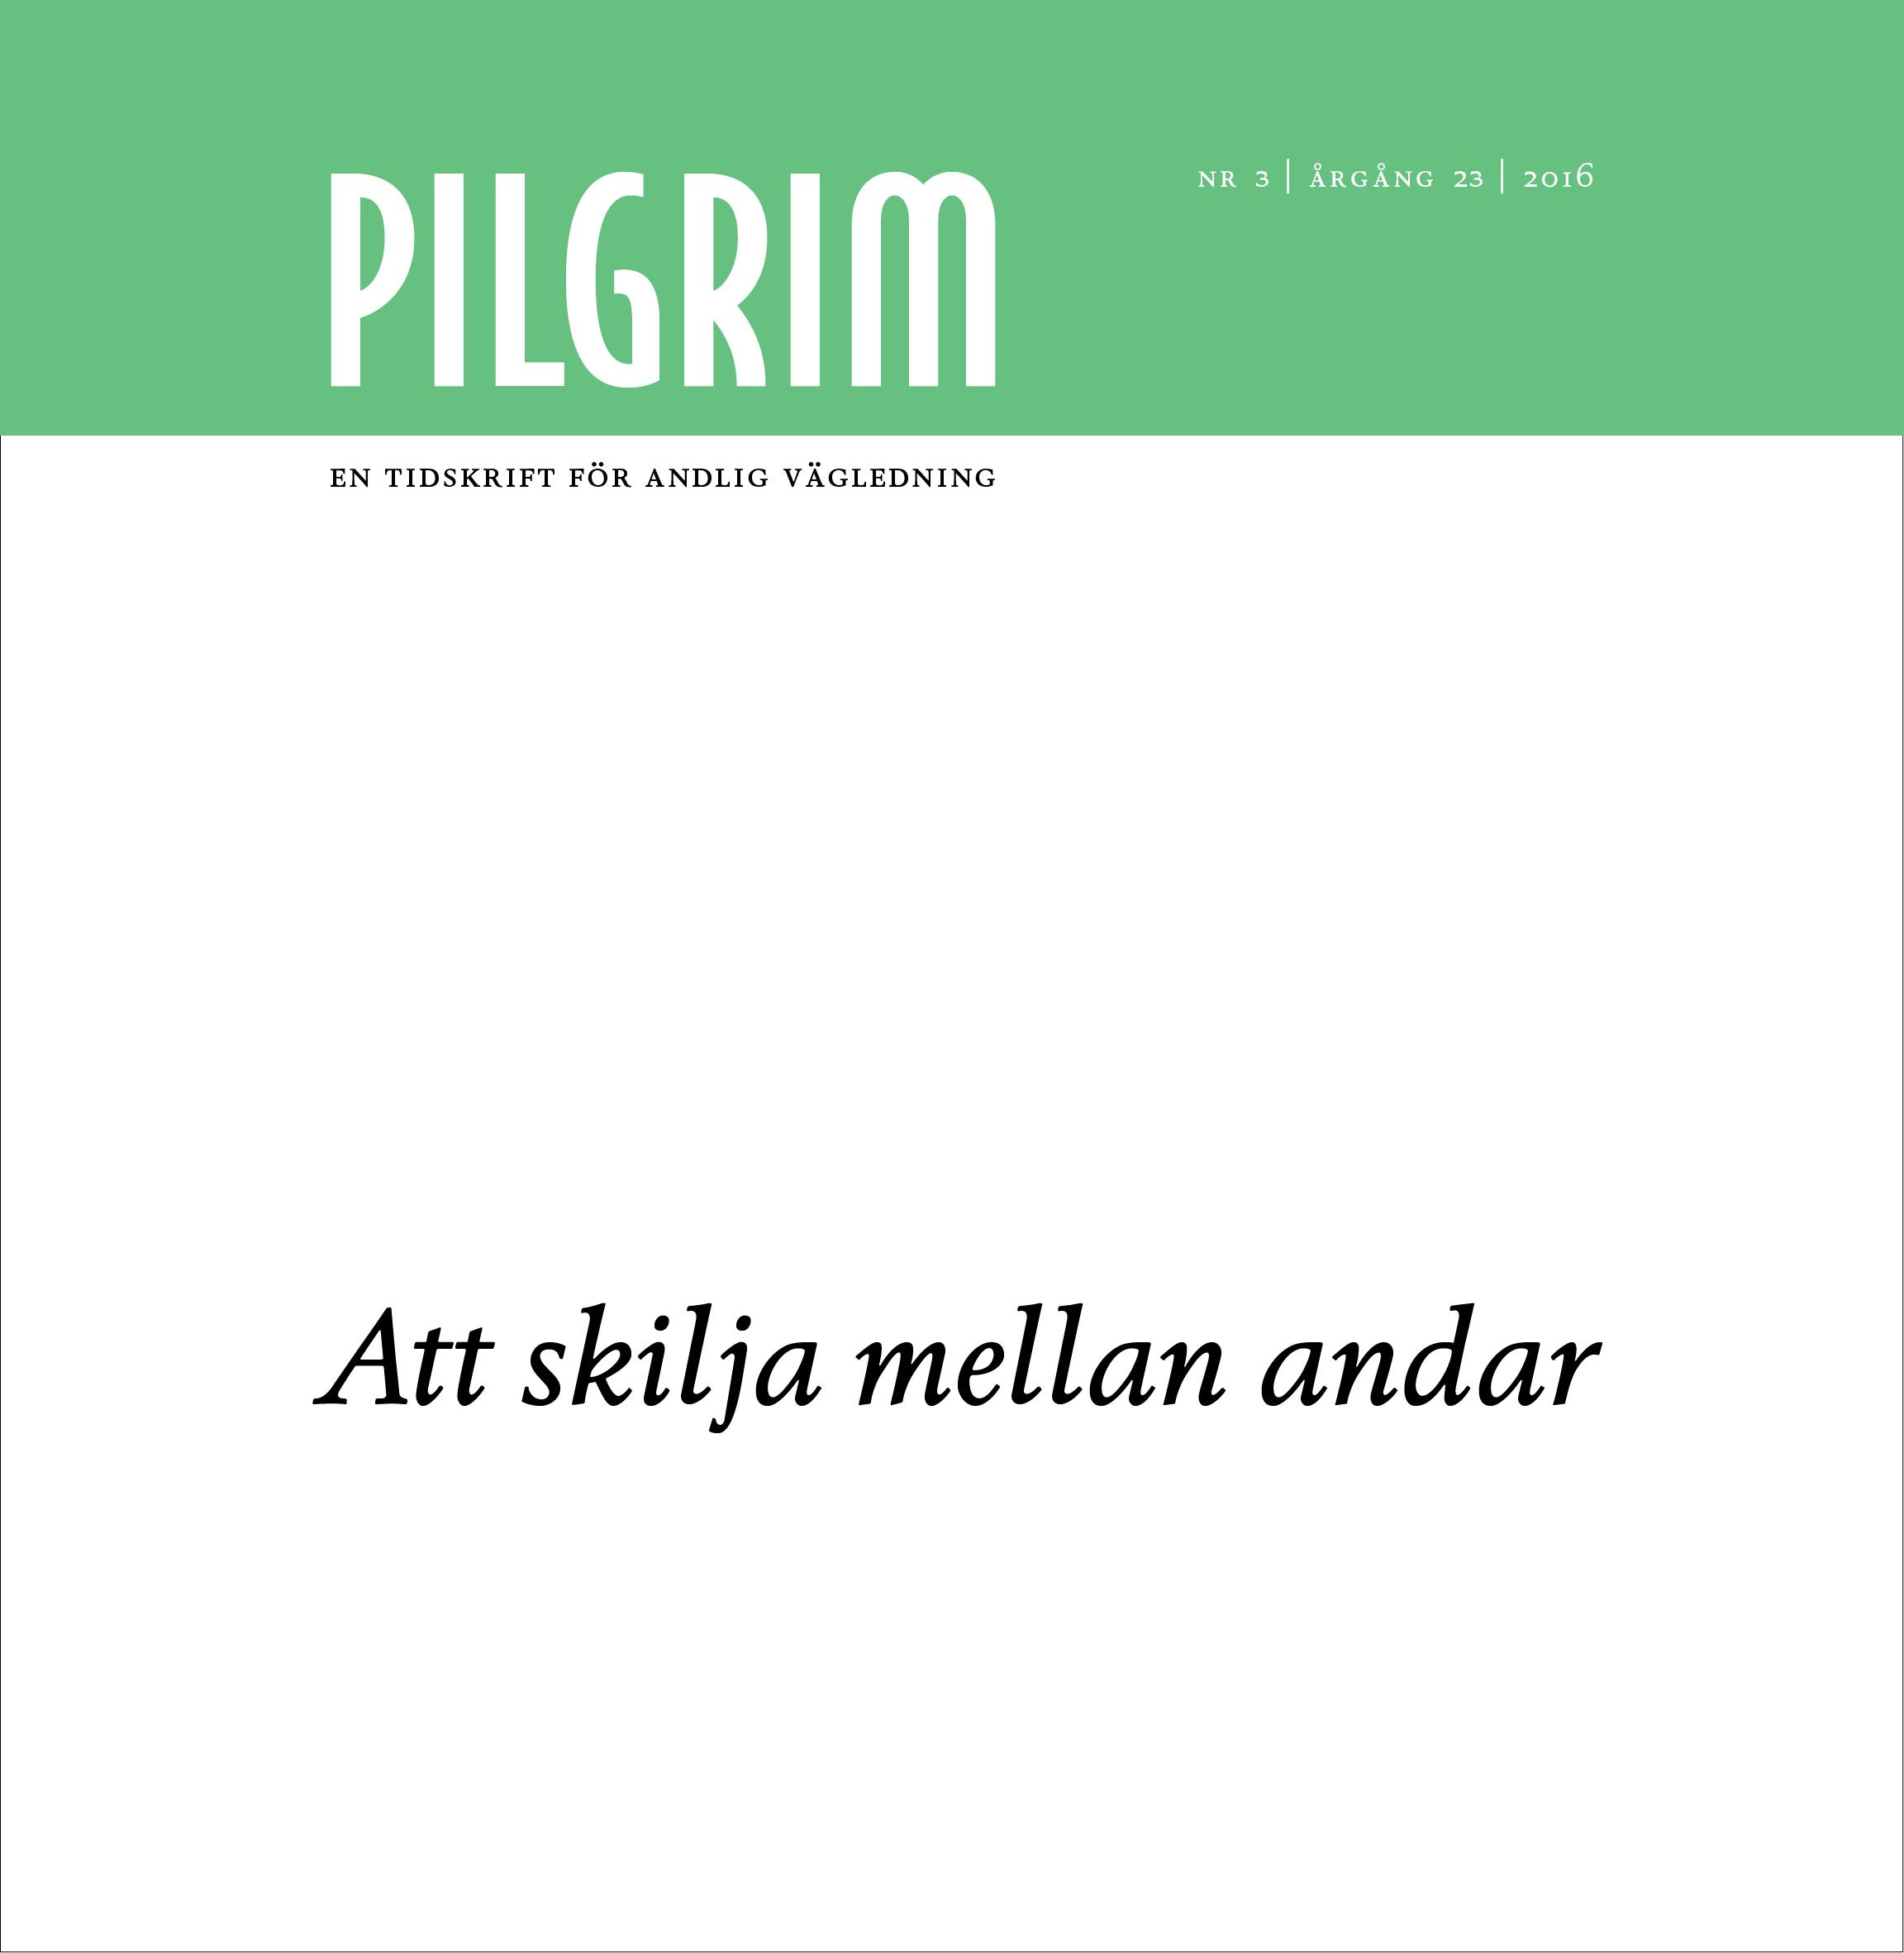 Pilgrim frams 2016-3